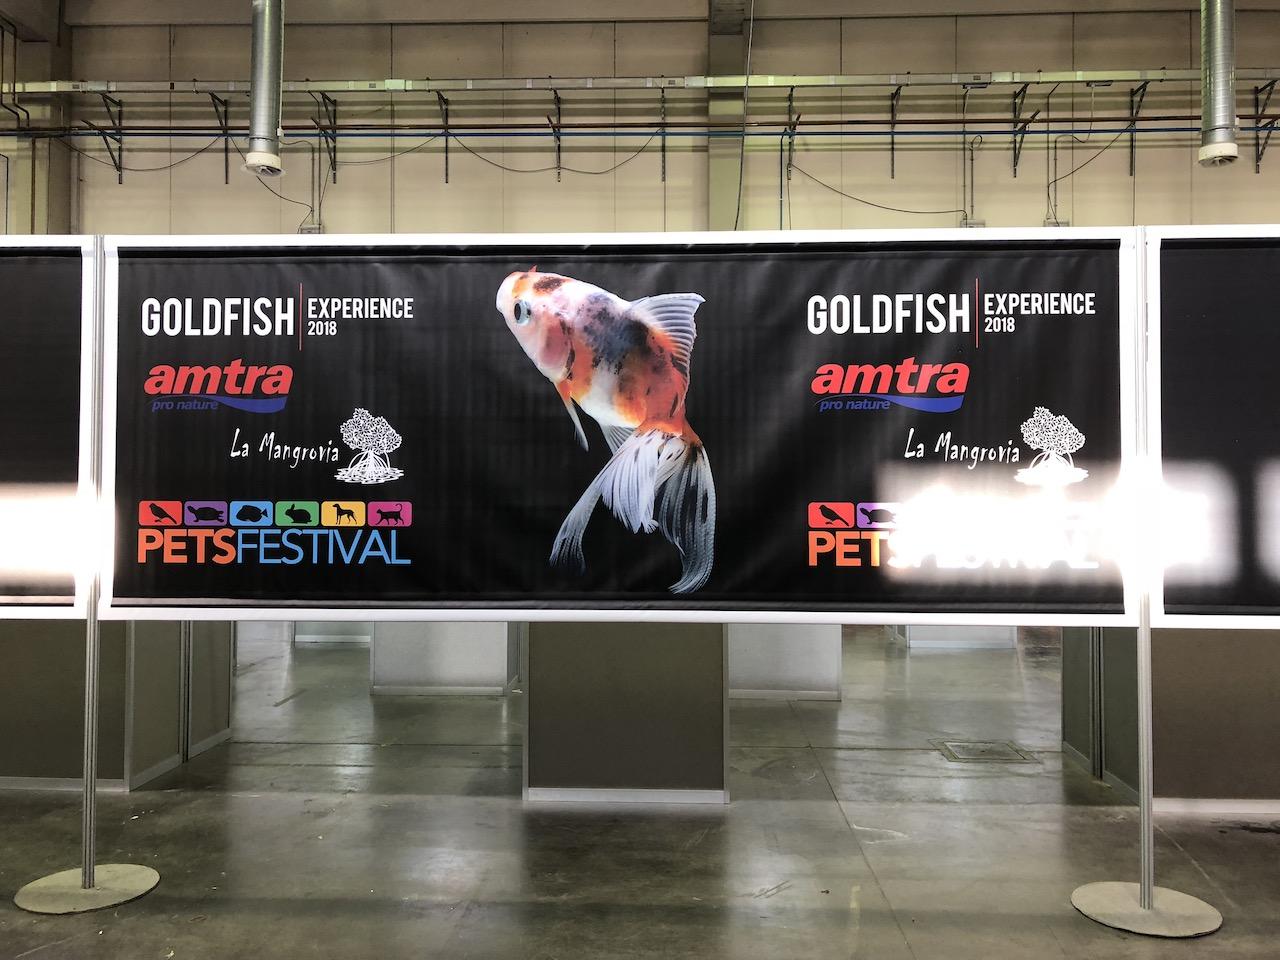 PetsFestival 2018 Goldfish Experience